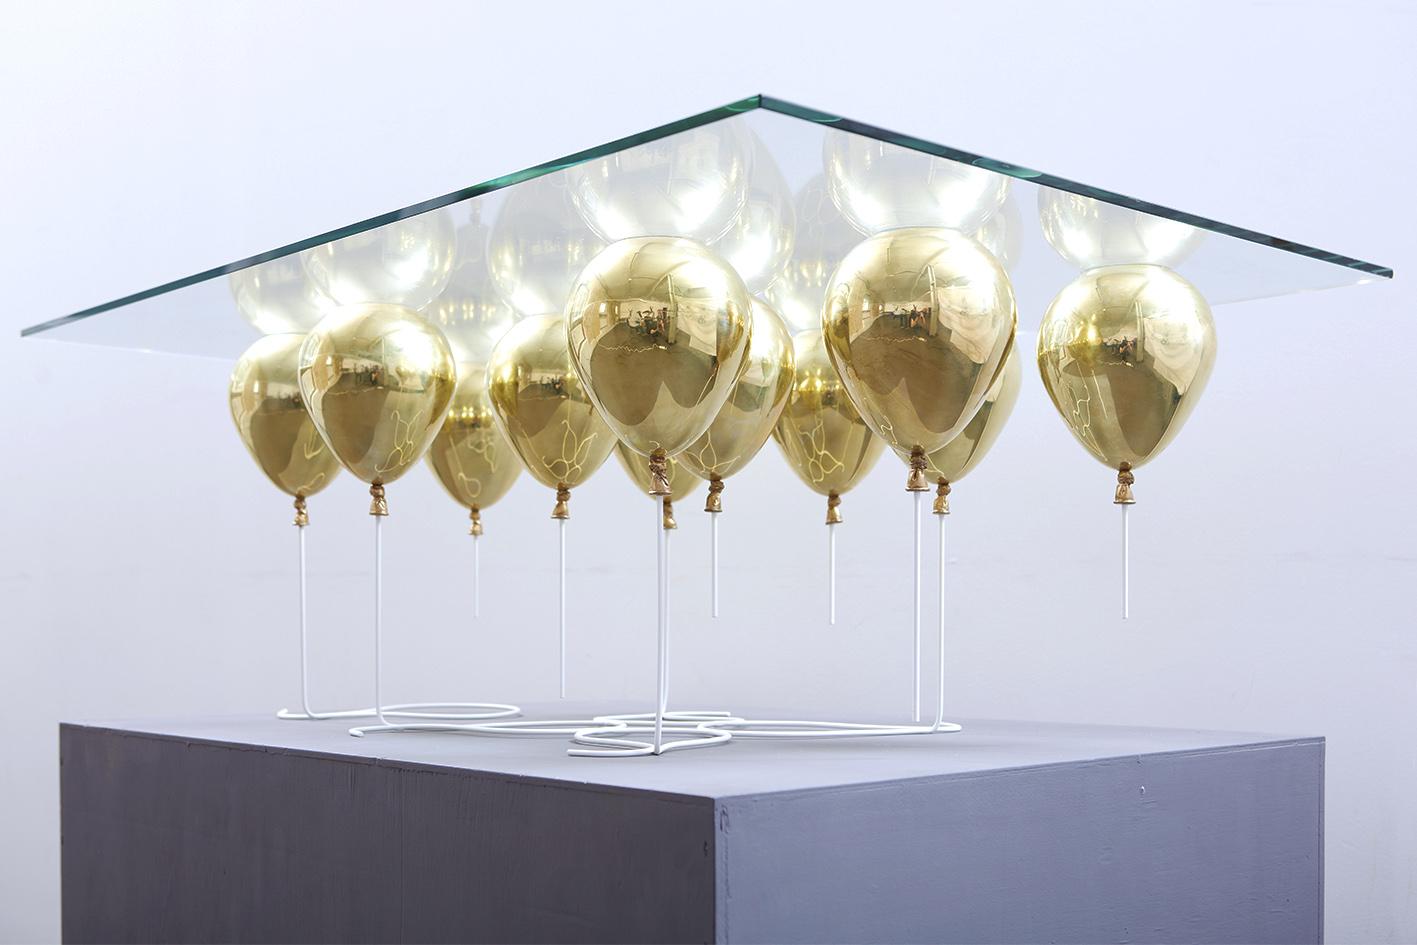 Balloons Choose An Option Gold Silver Mixed